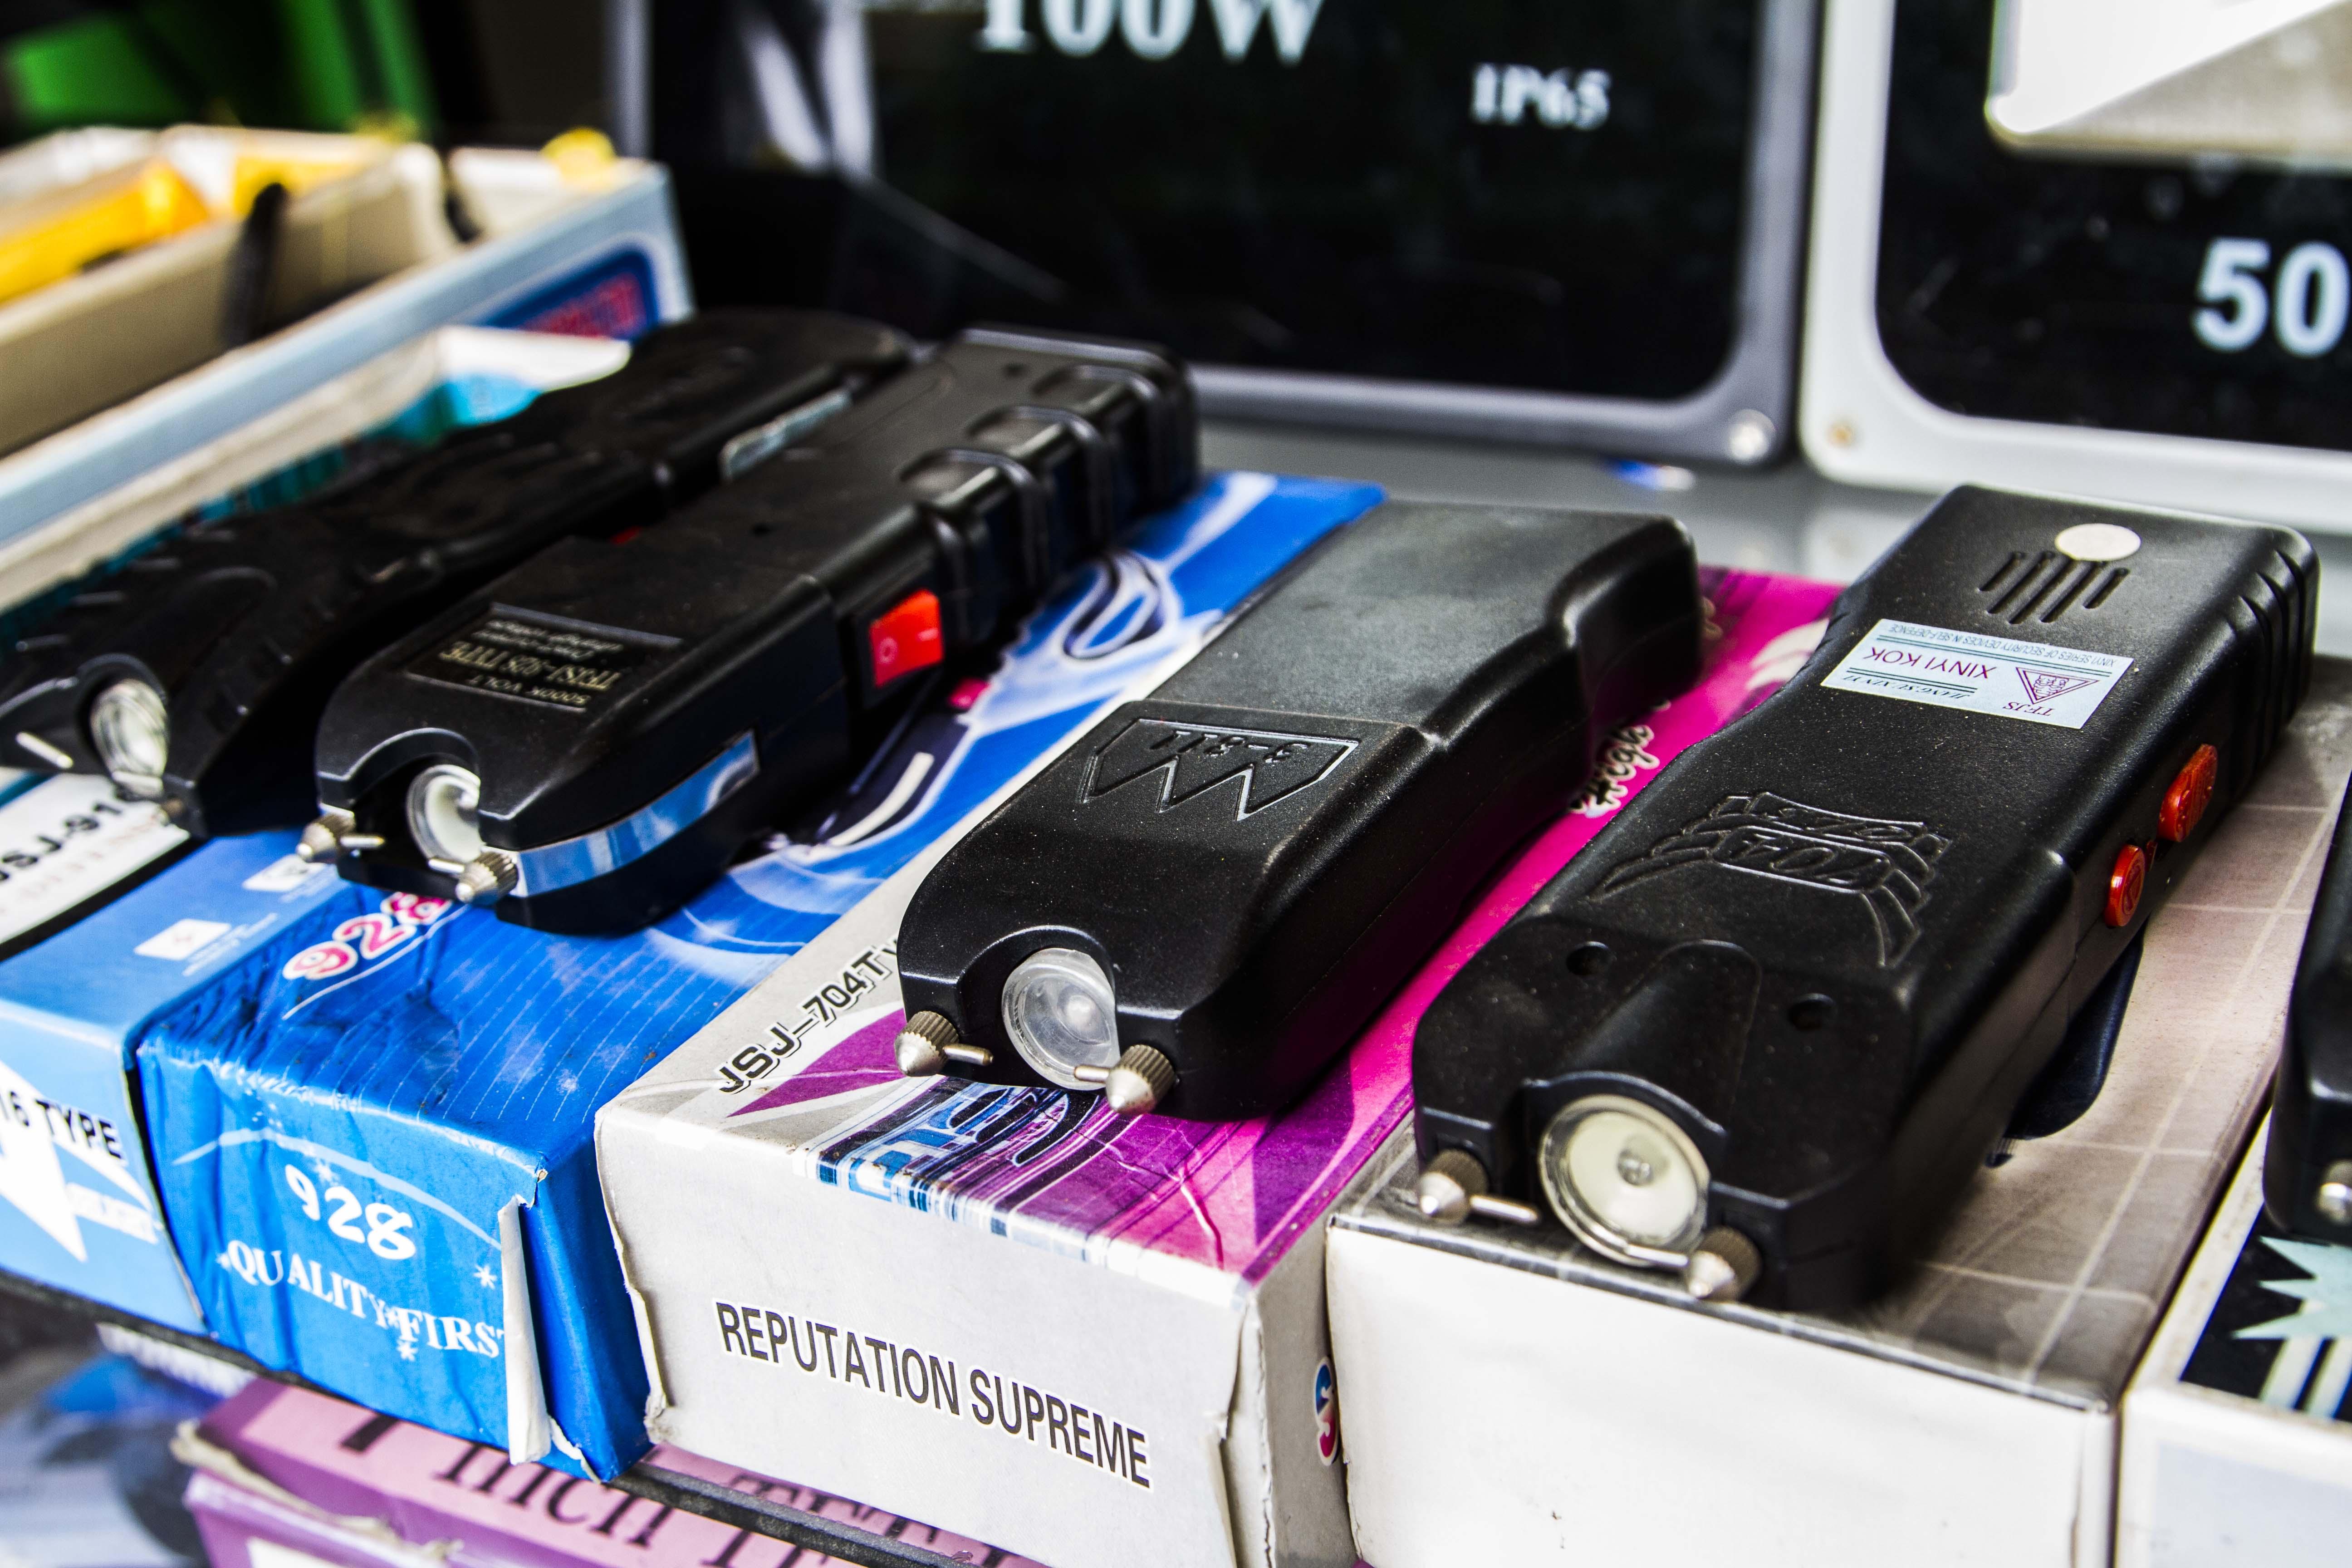 Montana Family Market_Electronics and CCTV Cameras_hand held tasors